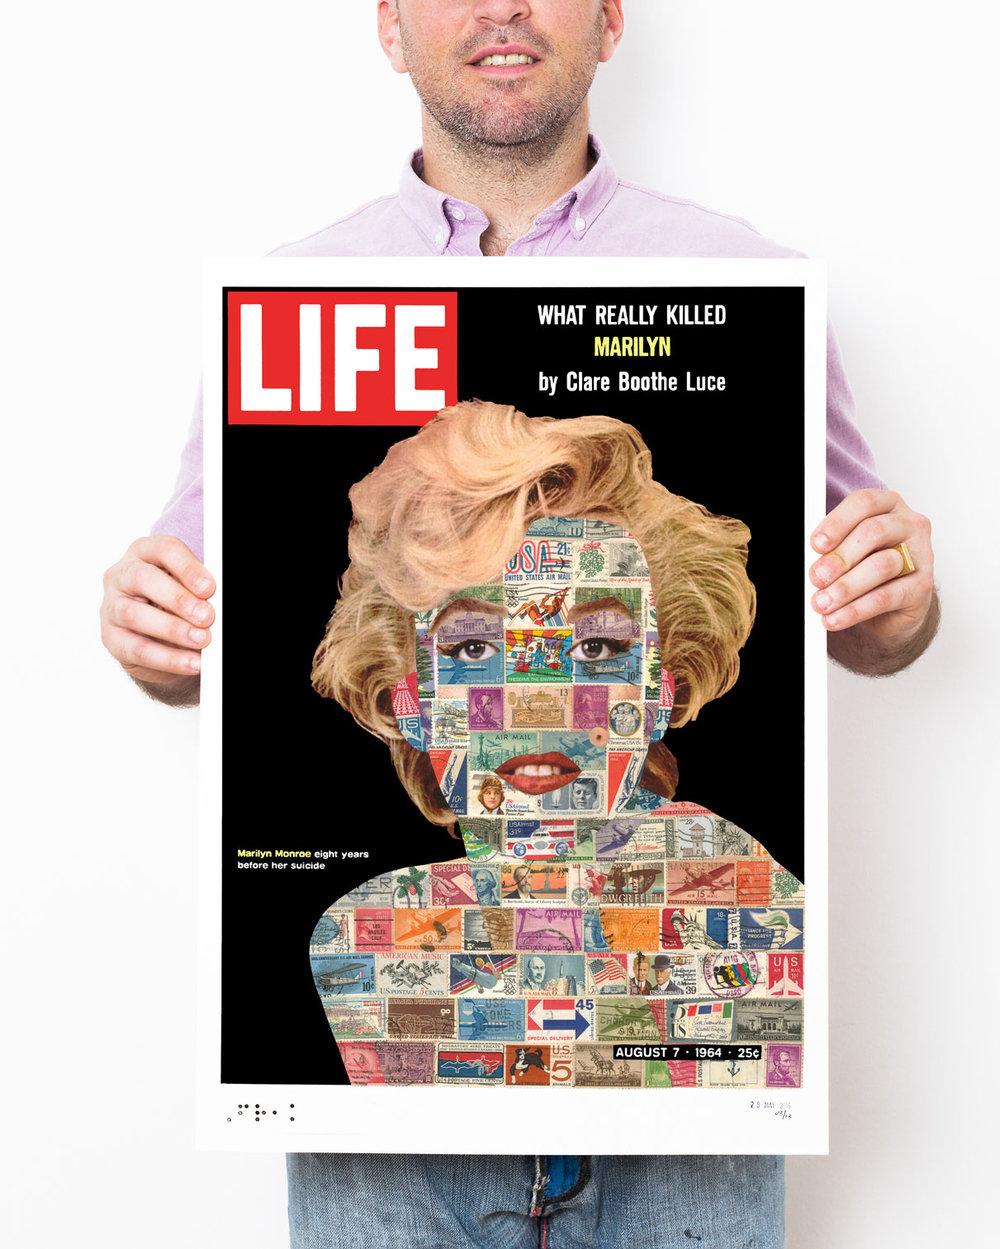 luigi-rodriguez-marilyn-monroe-life-magazine.jpg